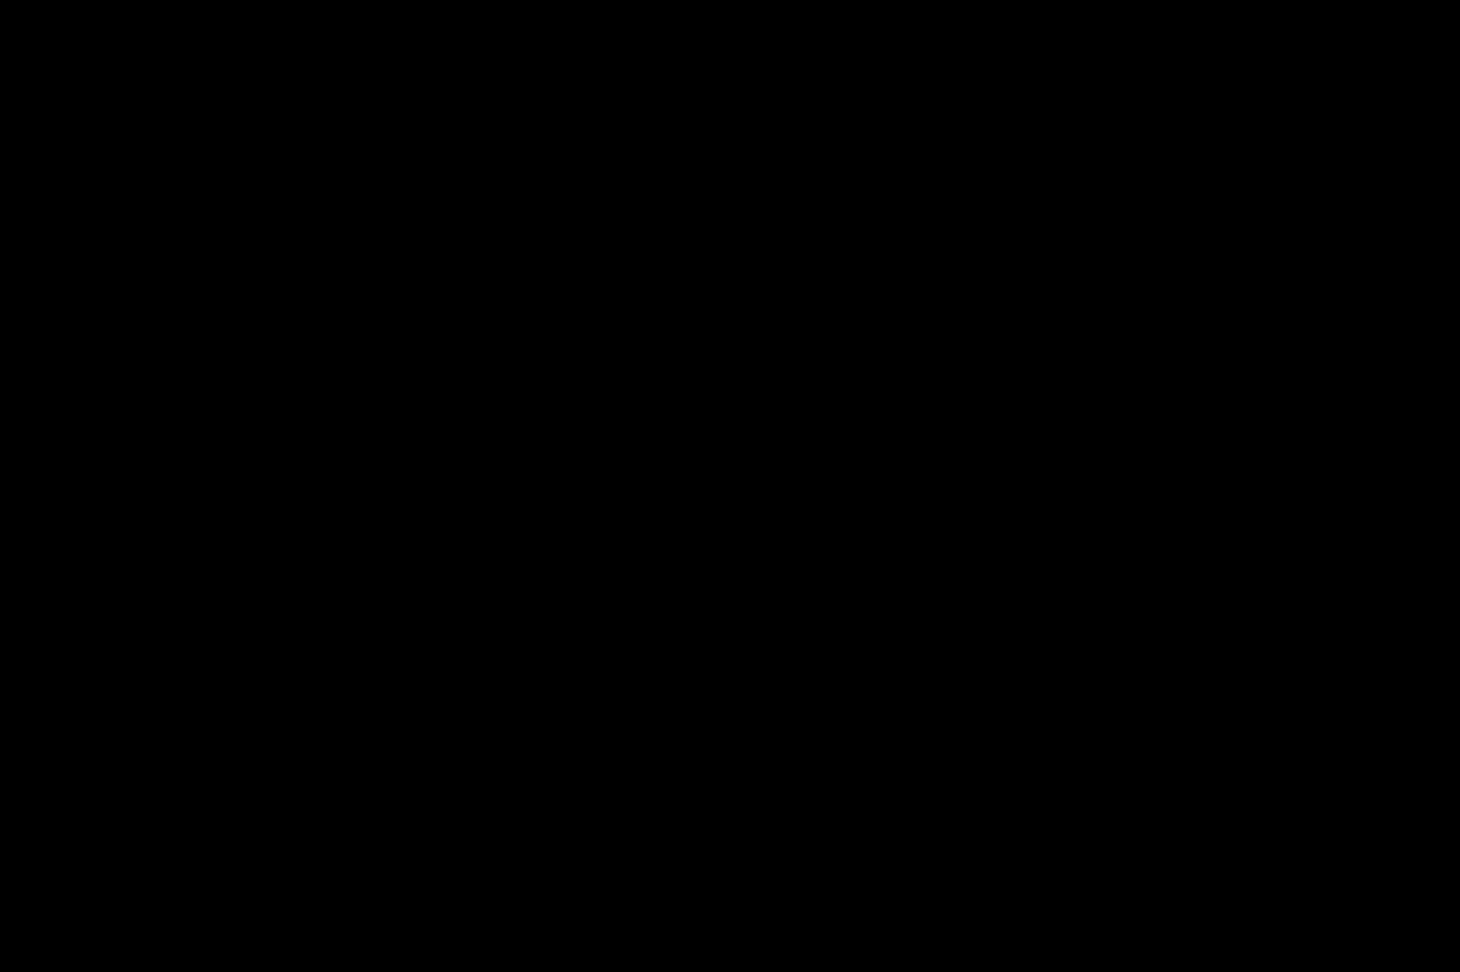 M da Behance_Tavola disegno 1 copia 5.png